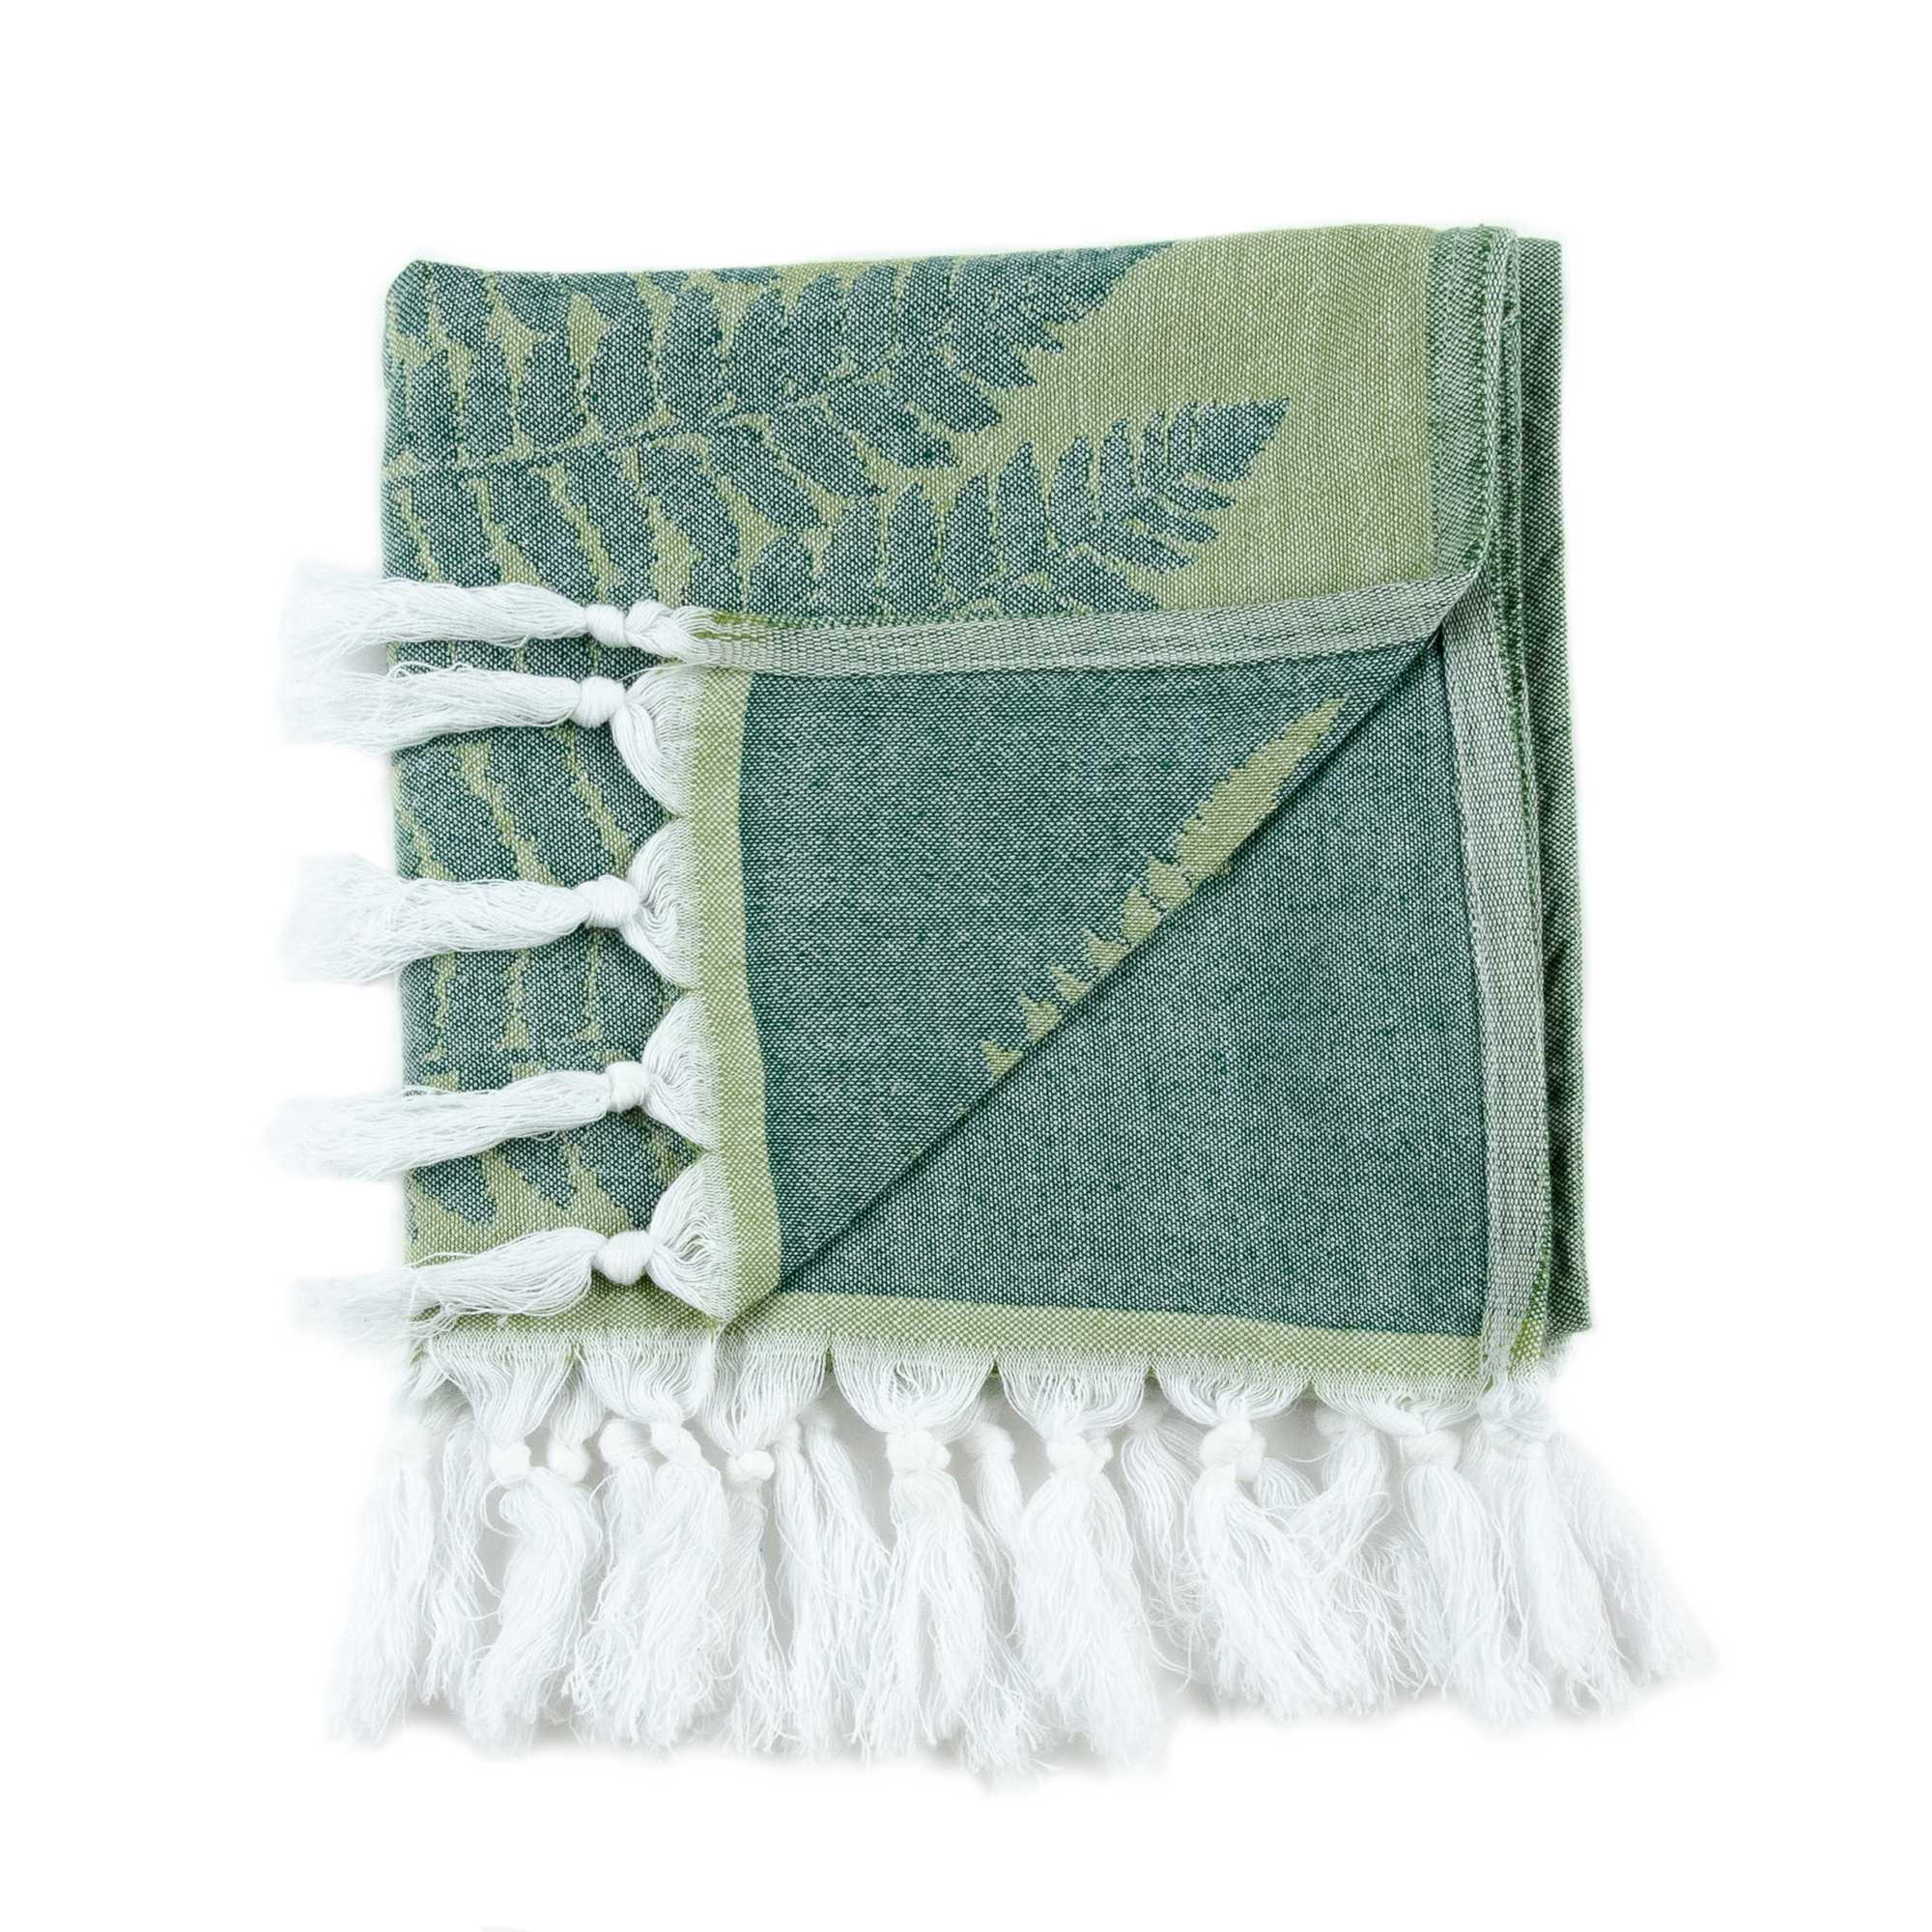 Custom Luxury Woven Towels's Product catelog